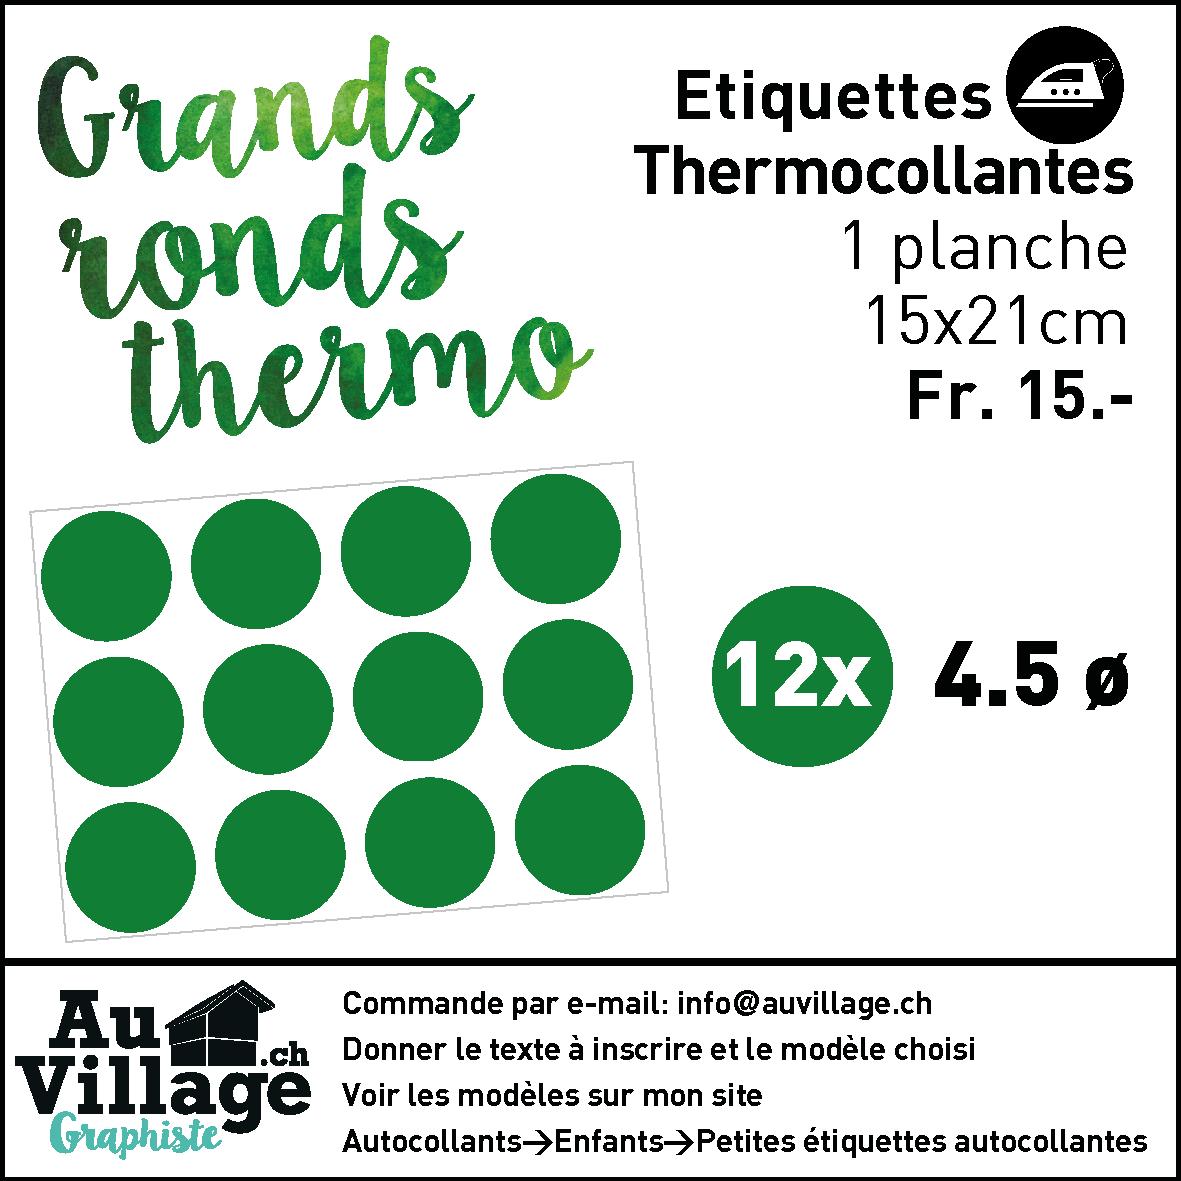 Etiquettes_vinyle&thermo-09